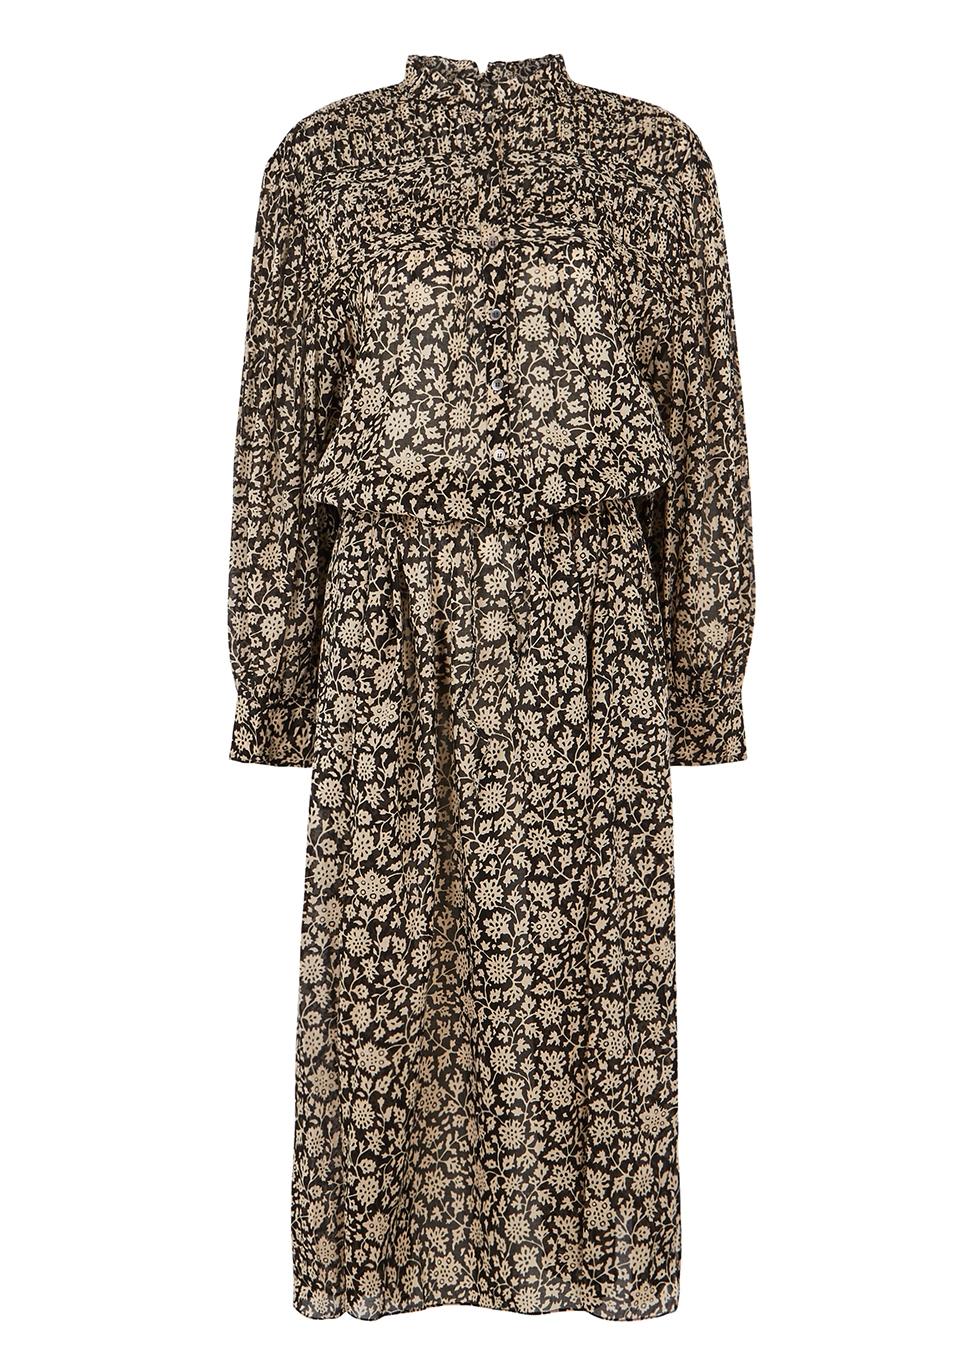 Perkins floral-print cotton midi dress